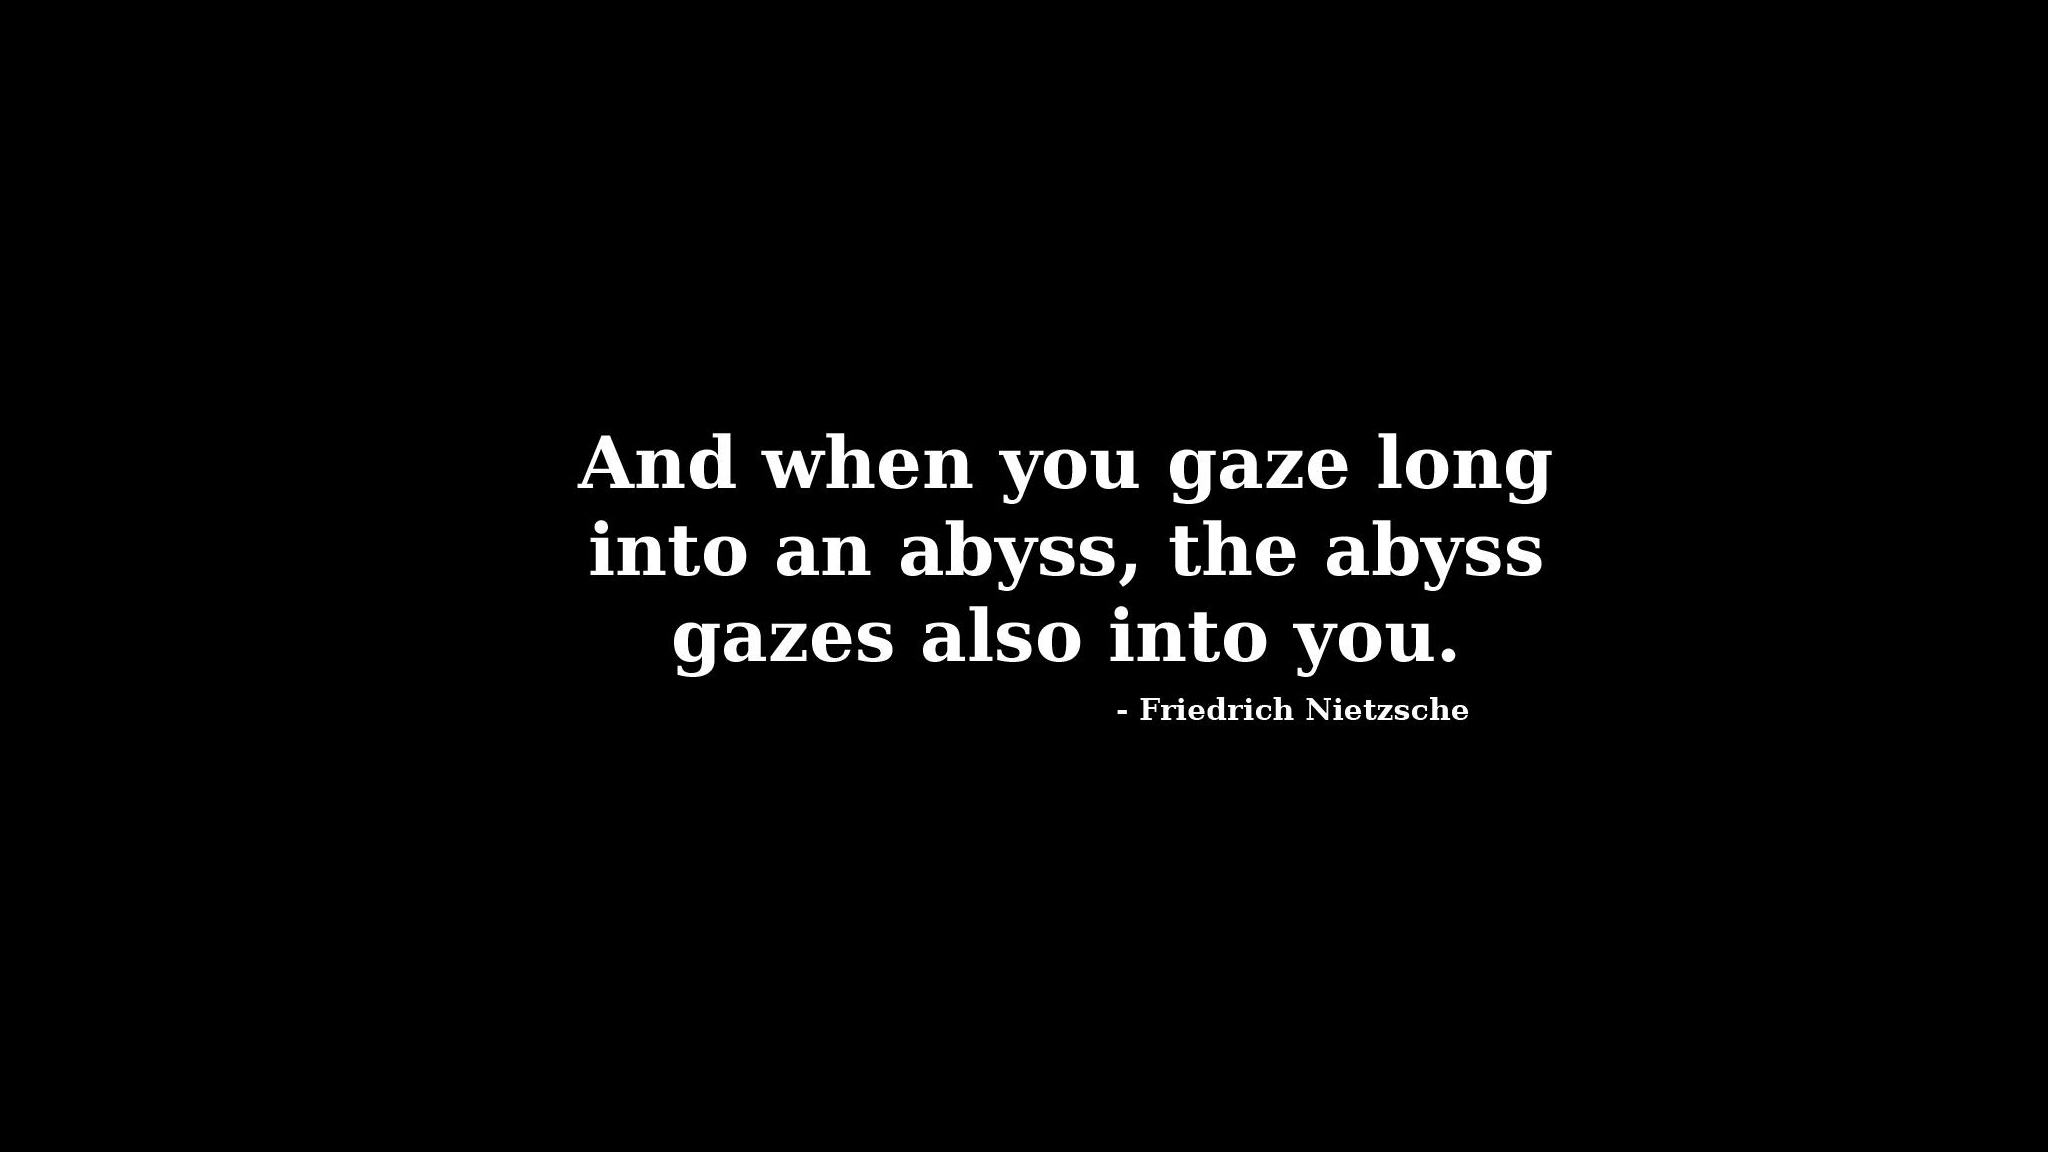 Quotes Nietzsche Quotes Friedrich Nietzsche